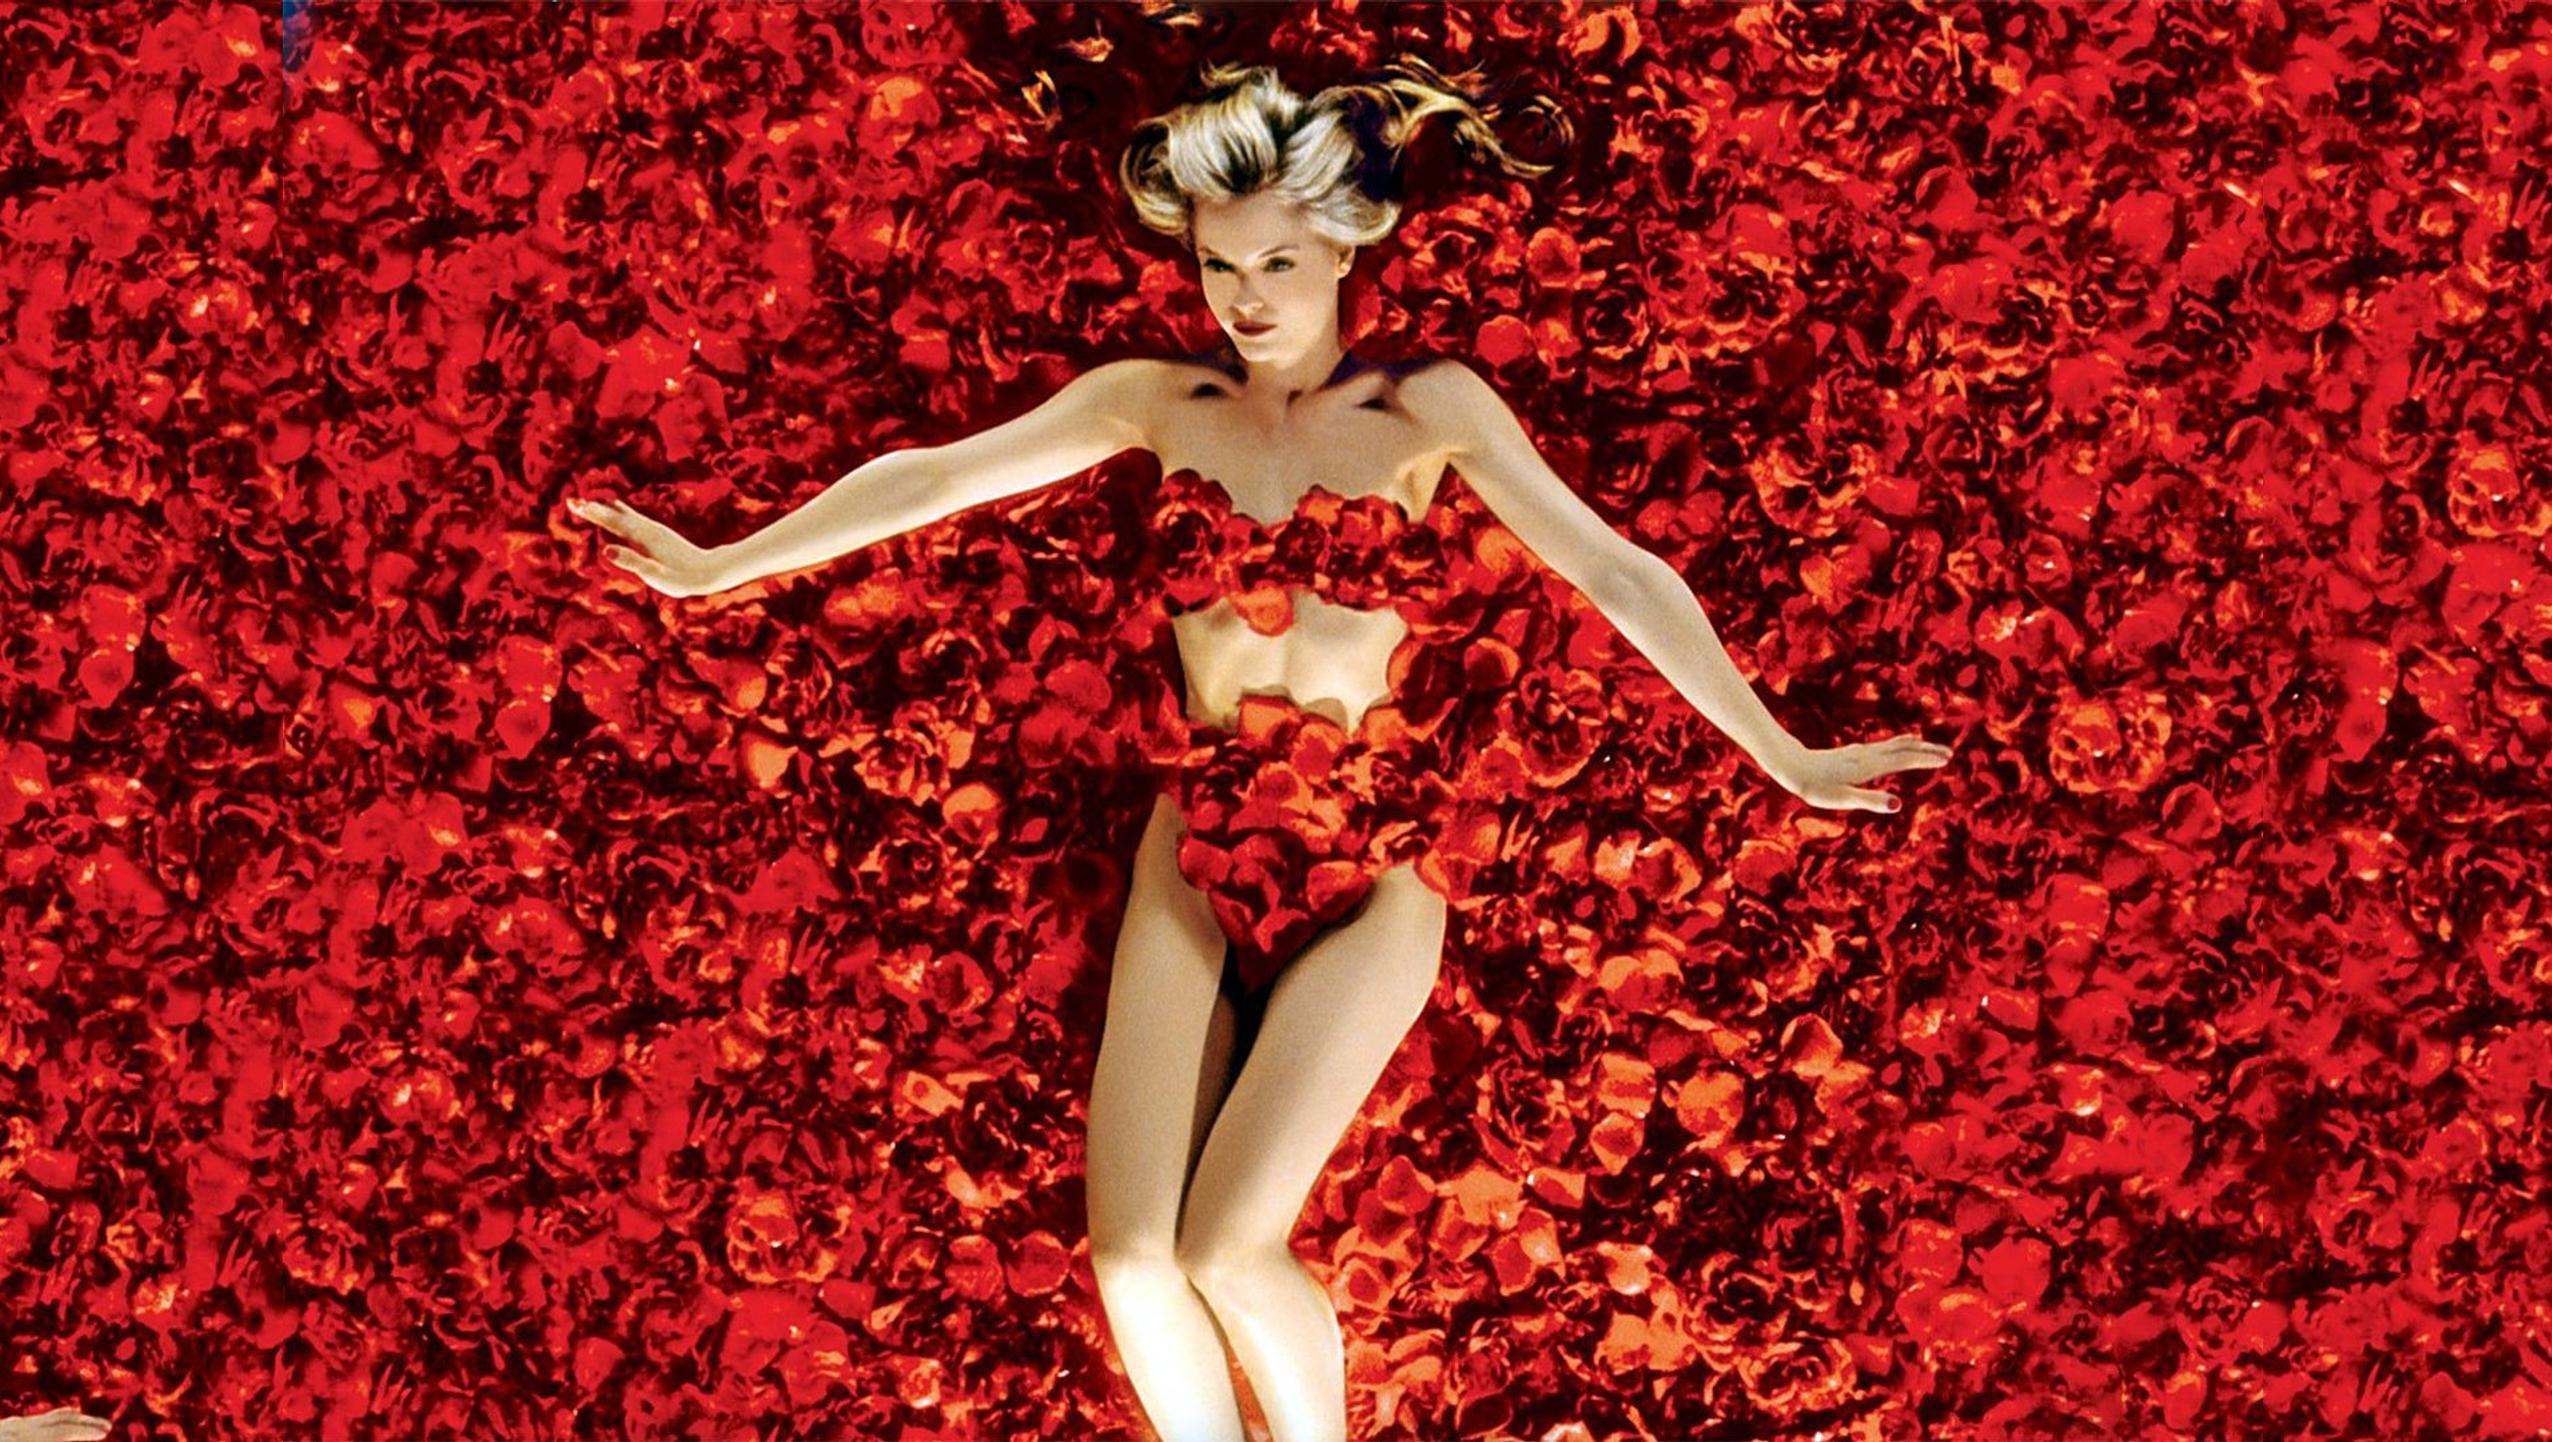 American Beauty 1999 Desktop Wallpaper Moviemania 2552x1442